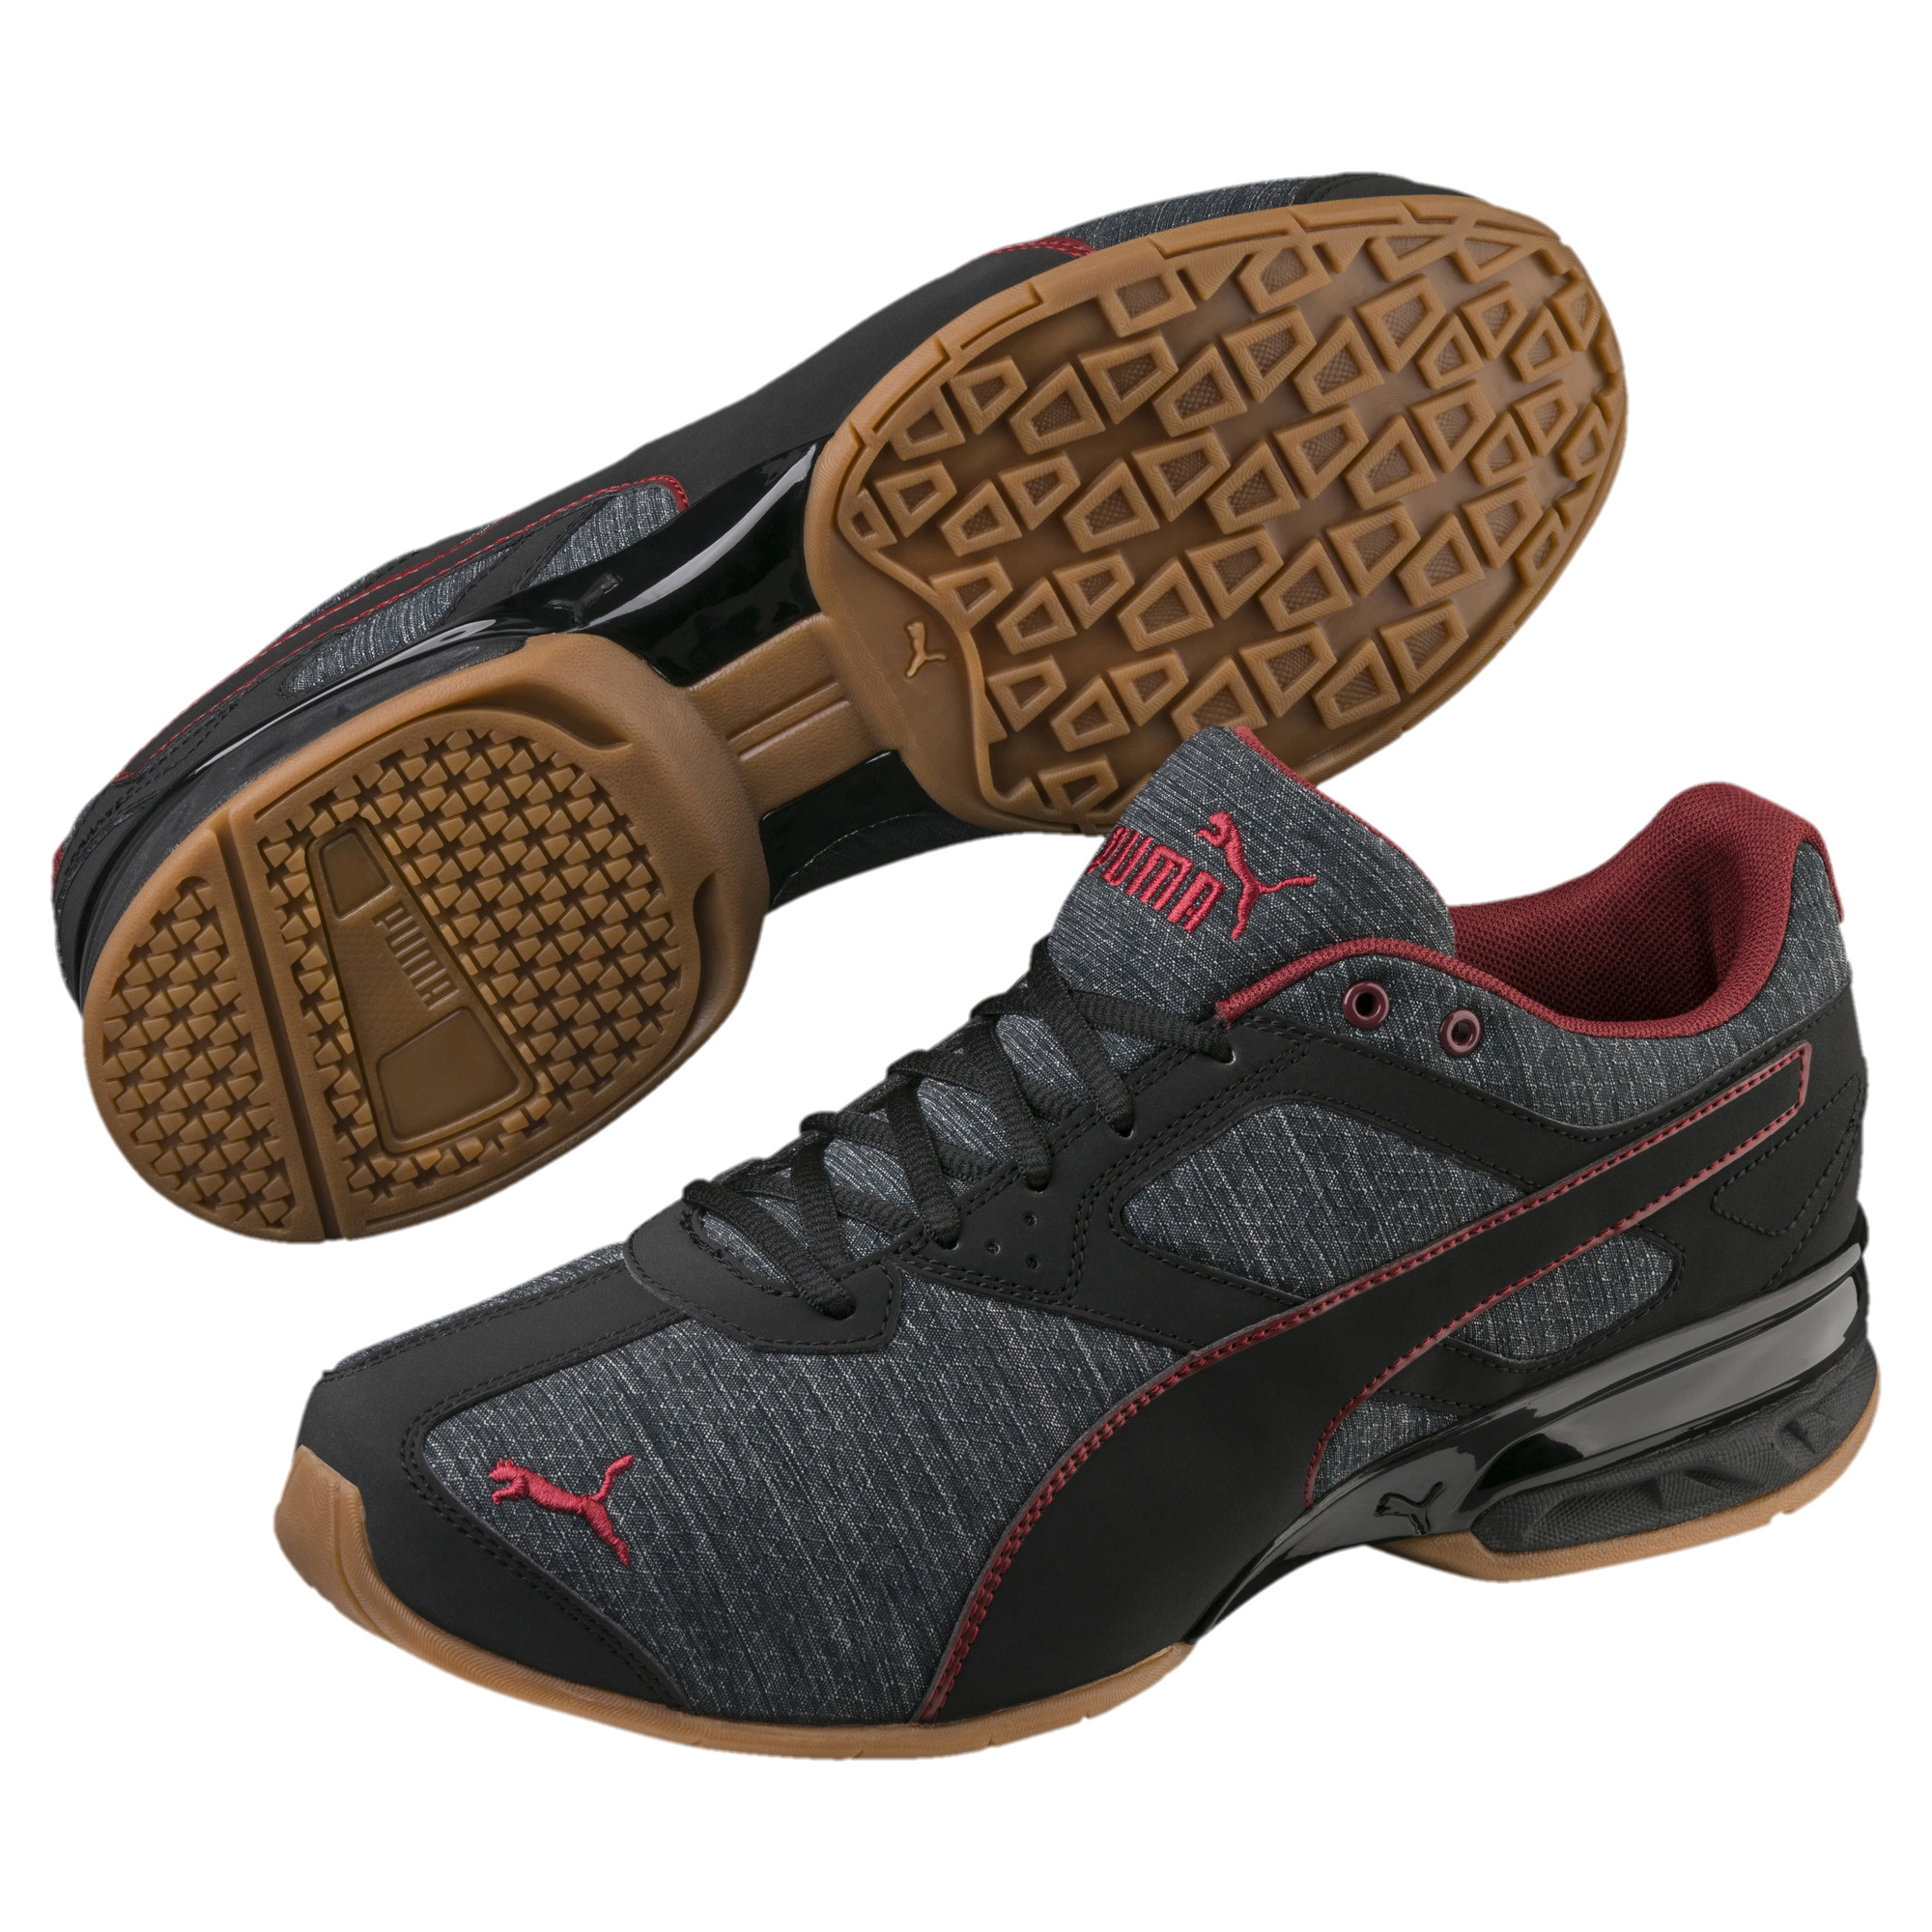 PUMA-Tazon-6-Heather-Rip-Men-s-Sneakers-Men-Shoe-Running thumbnail 3